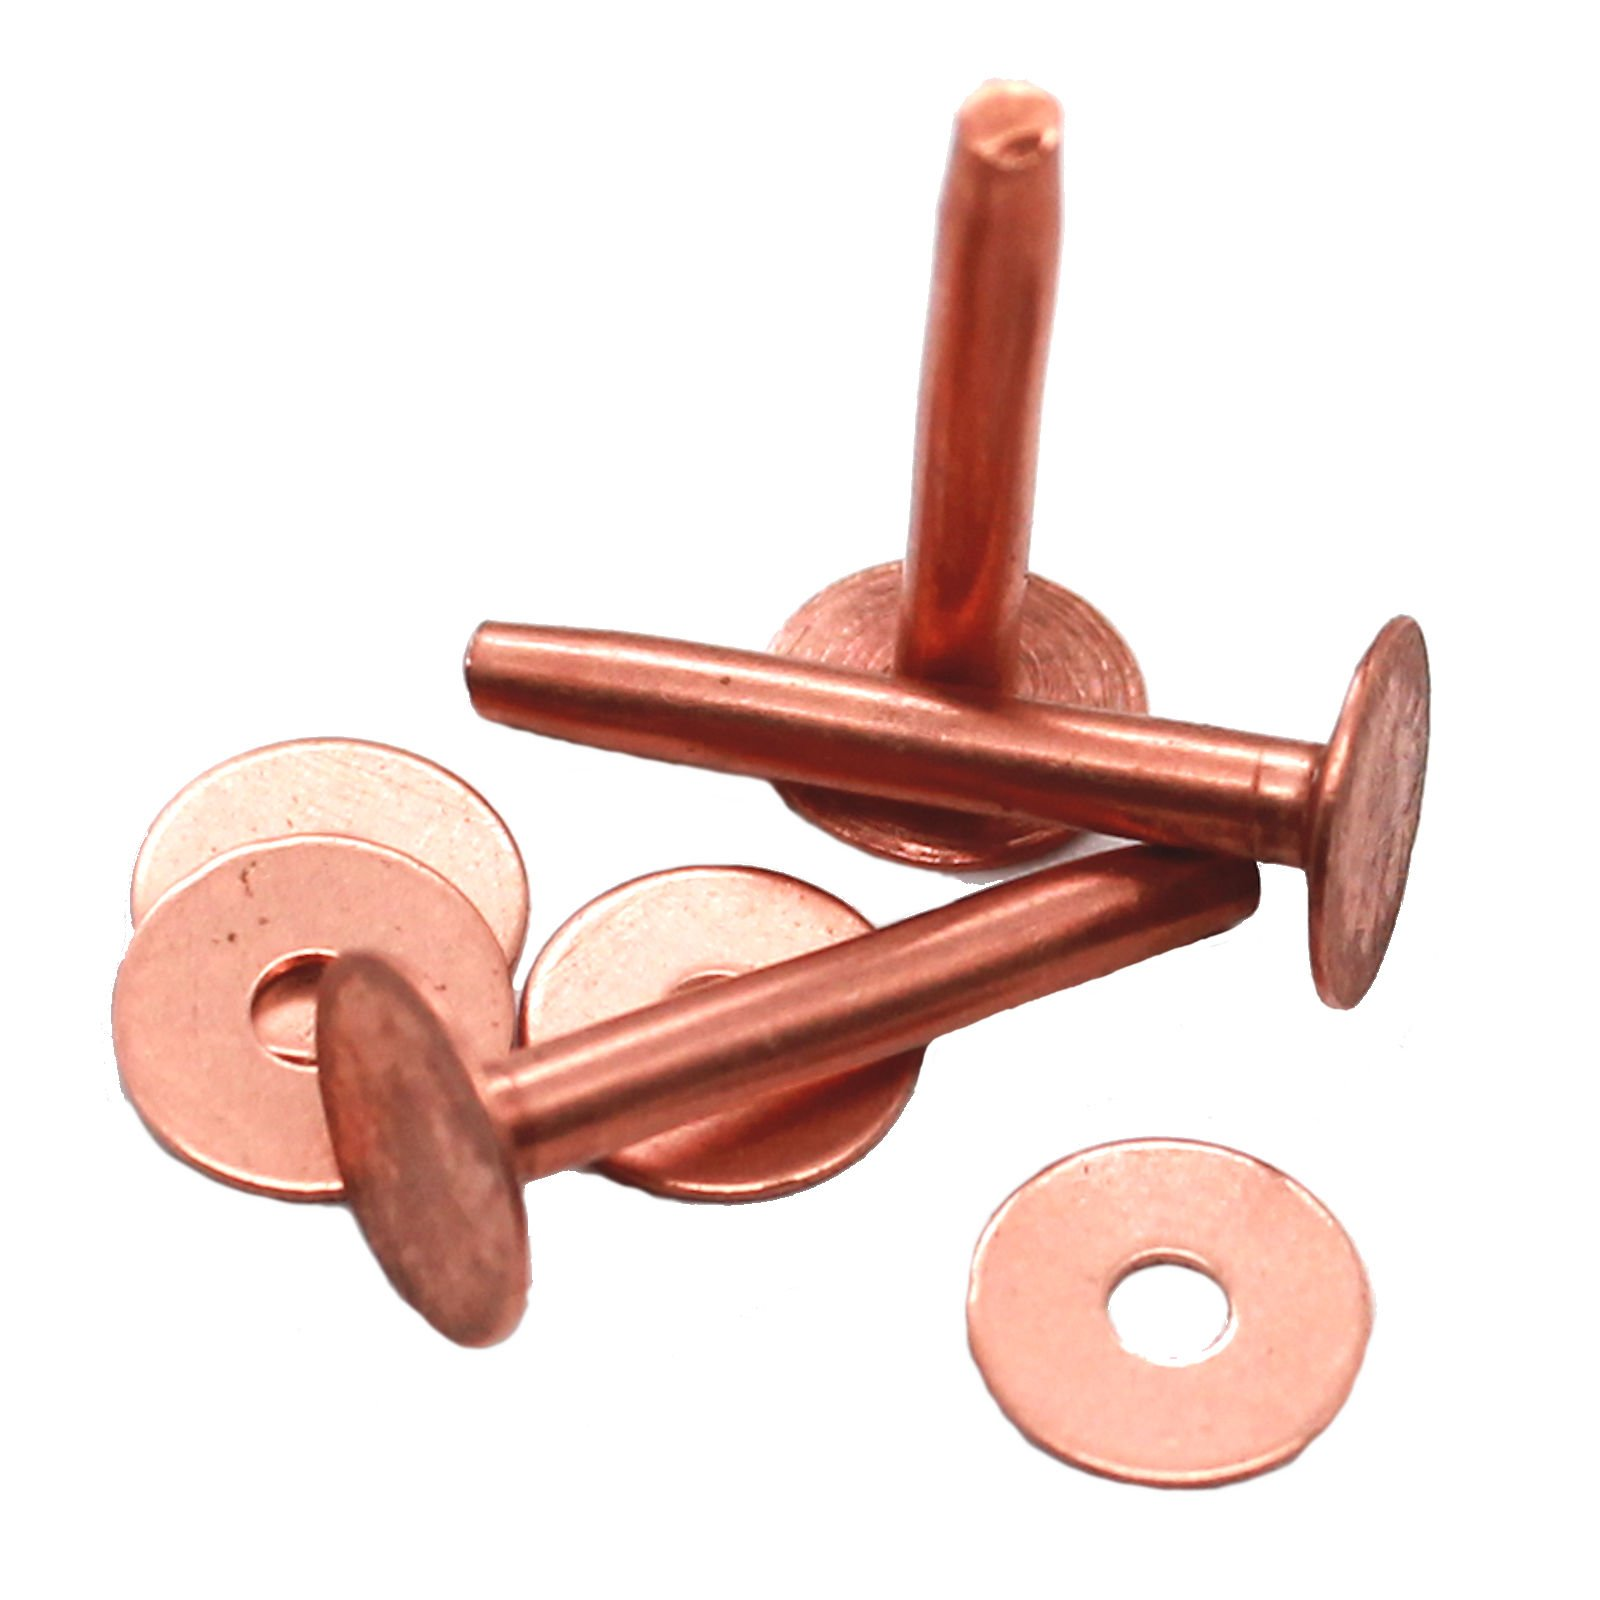 C.S. Osborne Size 14, 3/4'' Long Solid Copper Rivets 1 lb Box Approx. (300 Count)